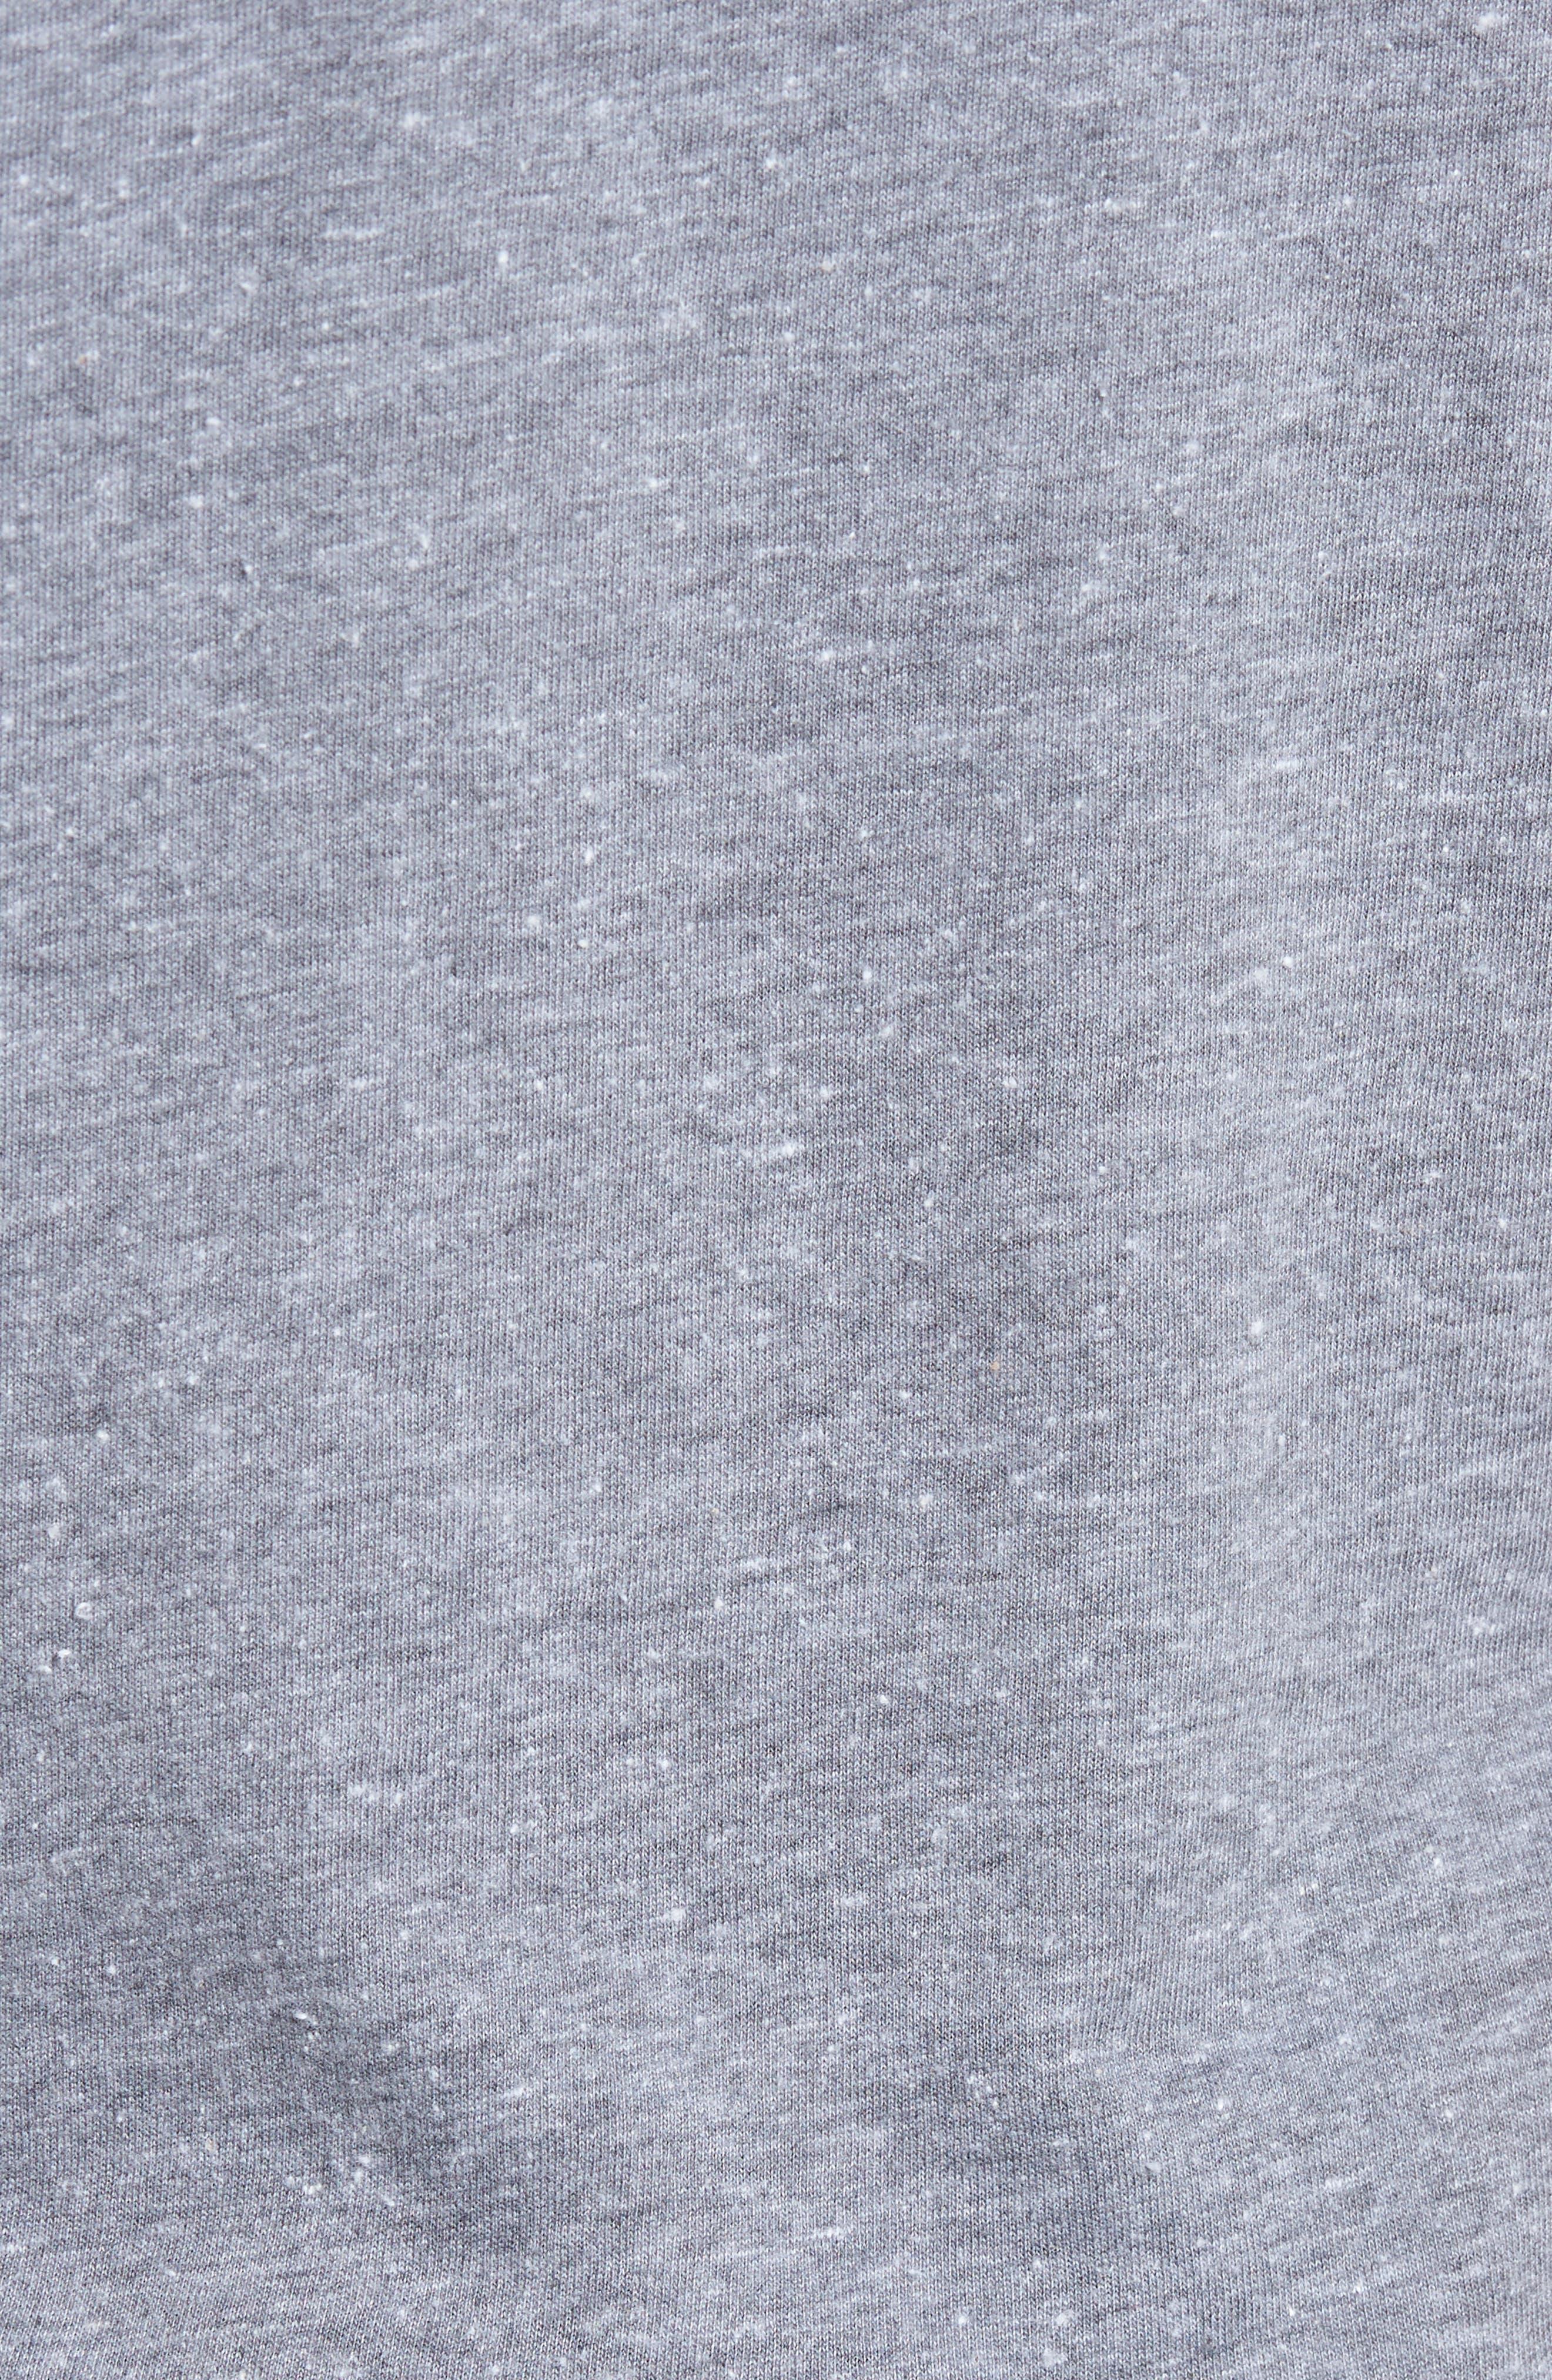 Freedom Graphic T-Shirt,                             Alternate thumbnail 5, color,                             Hematite